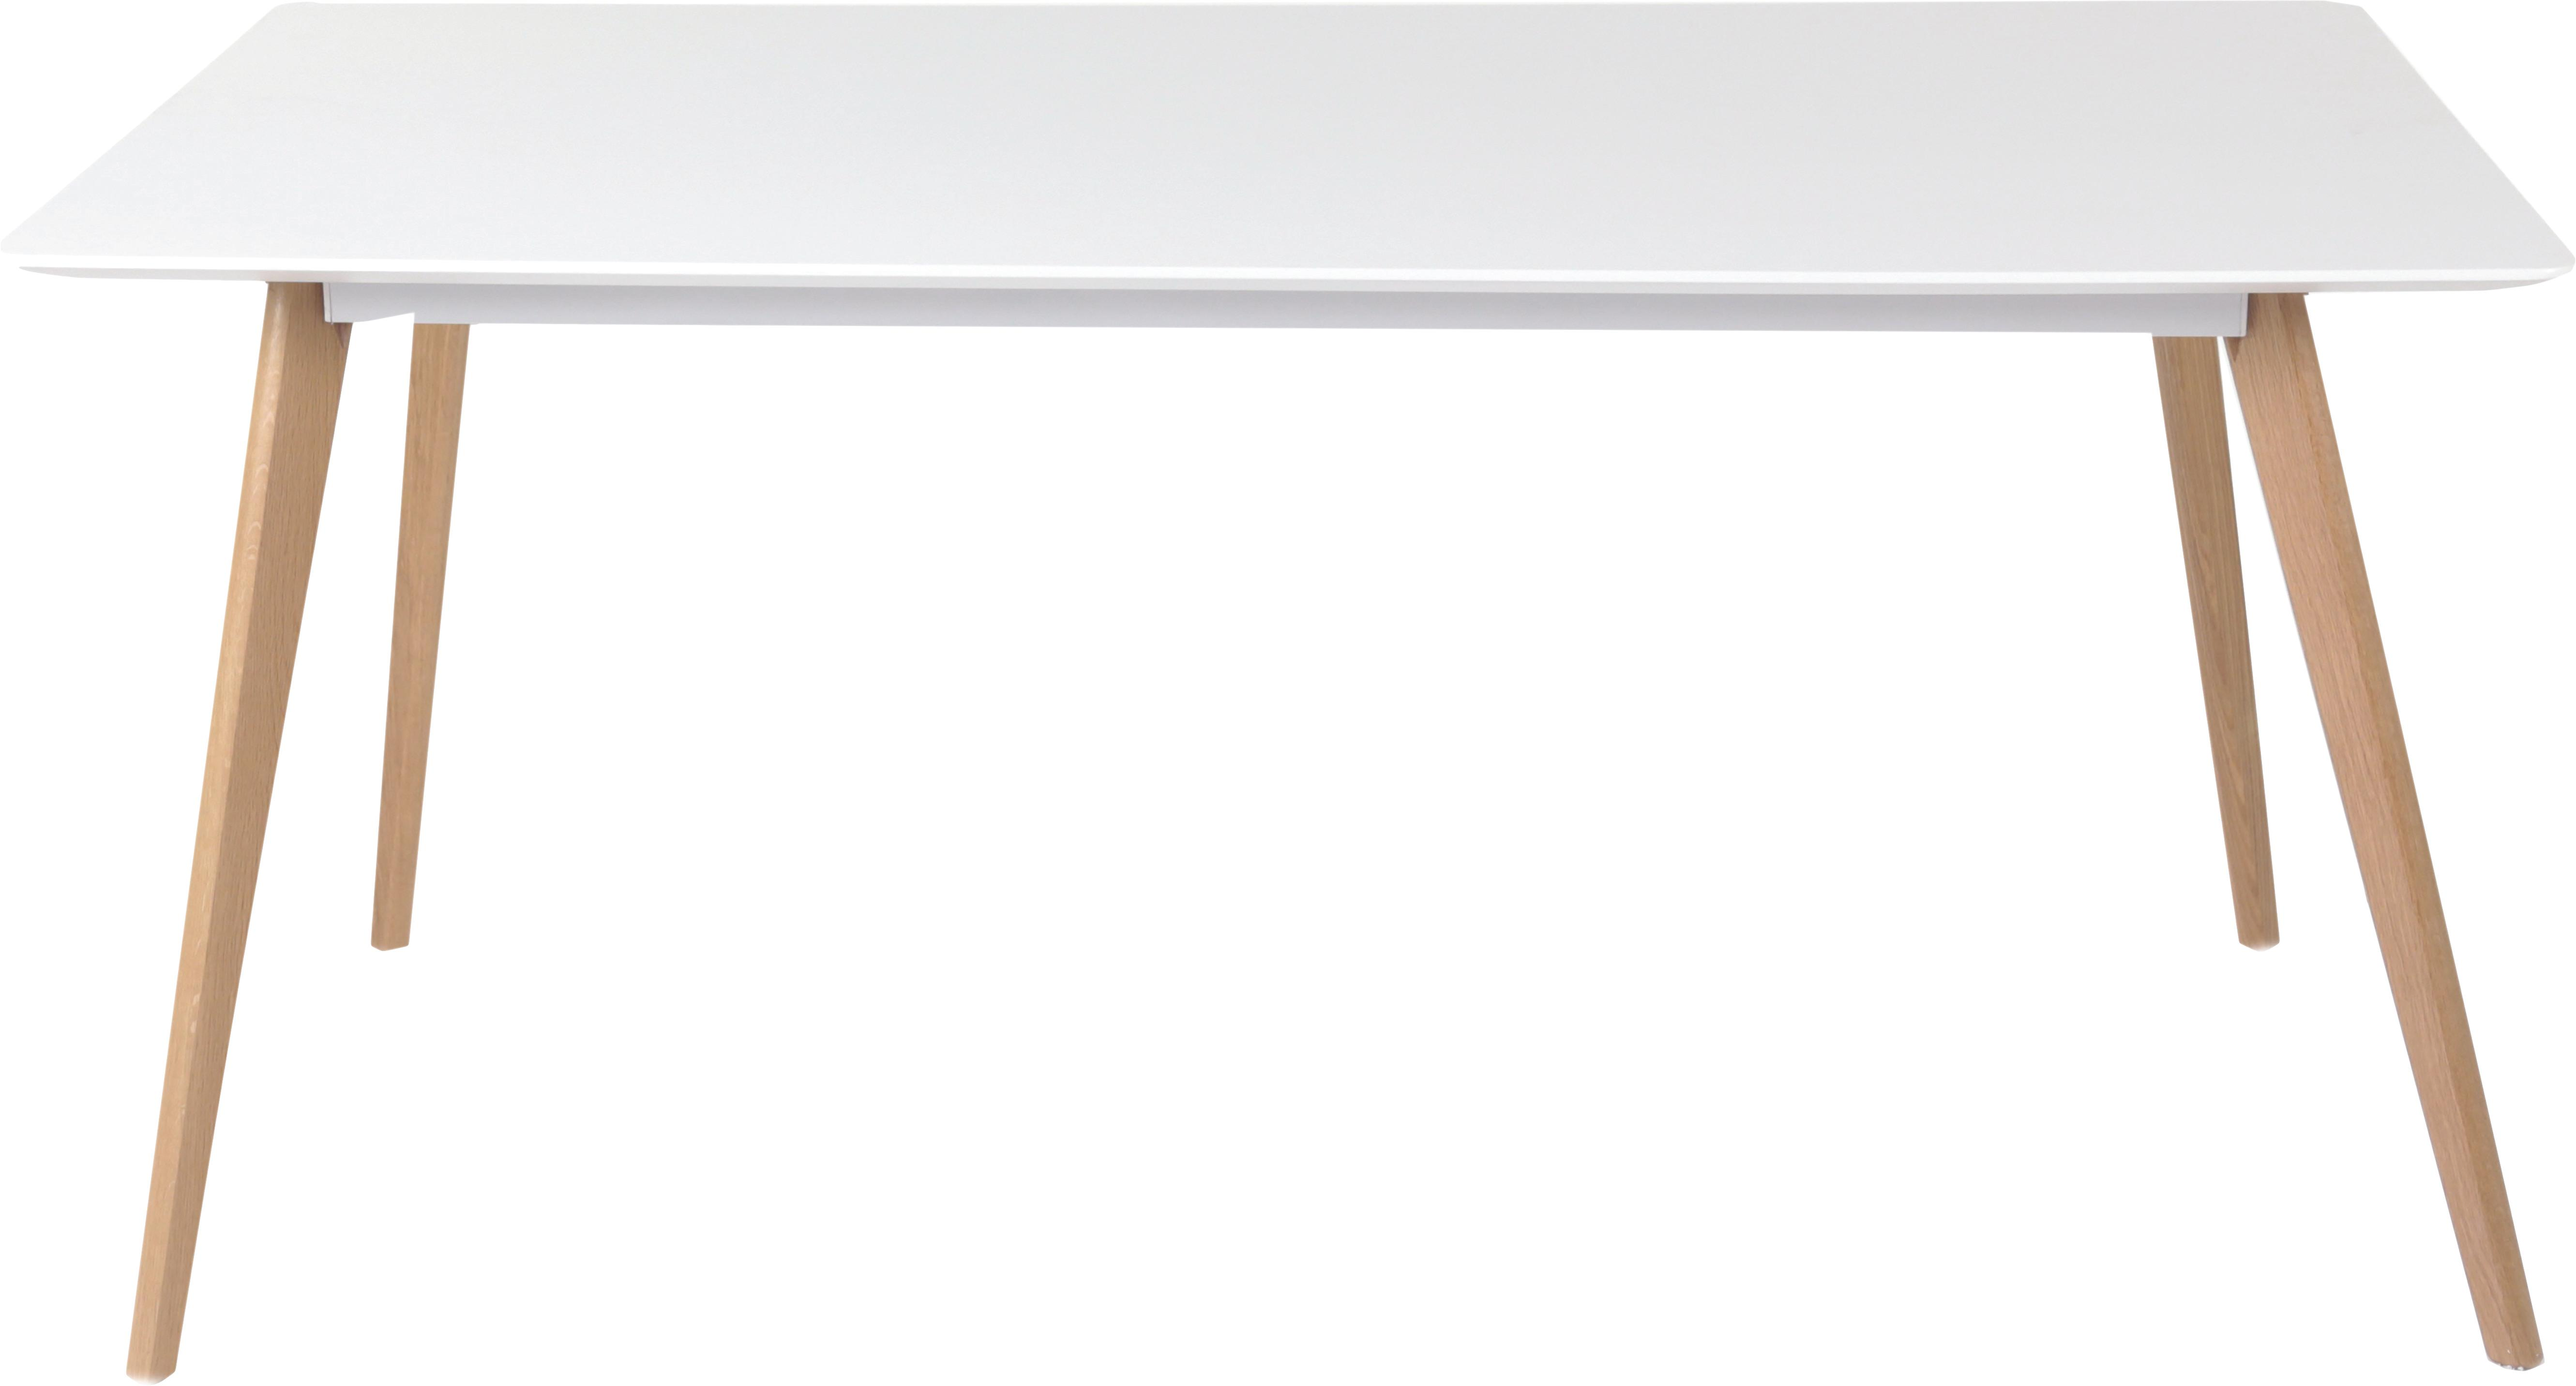 Mesa de comedor Flamy, estilo escandinavo, Tablero: fibras de densidad media , Patas: madera de roble aceitada, Blanco, roble, An 160 x F 90 cm